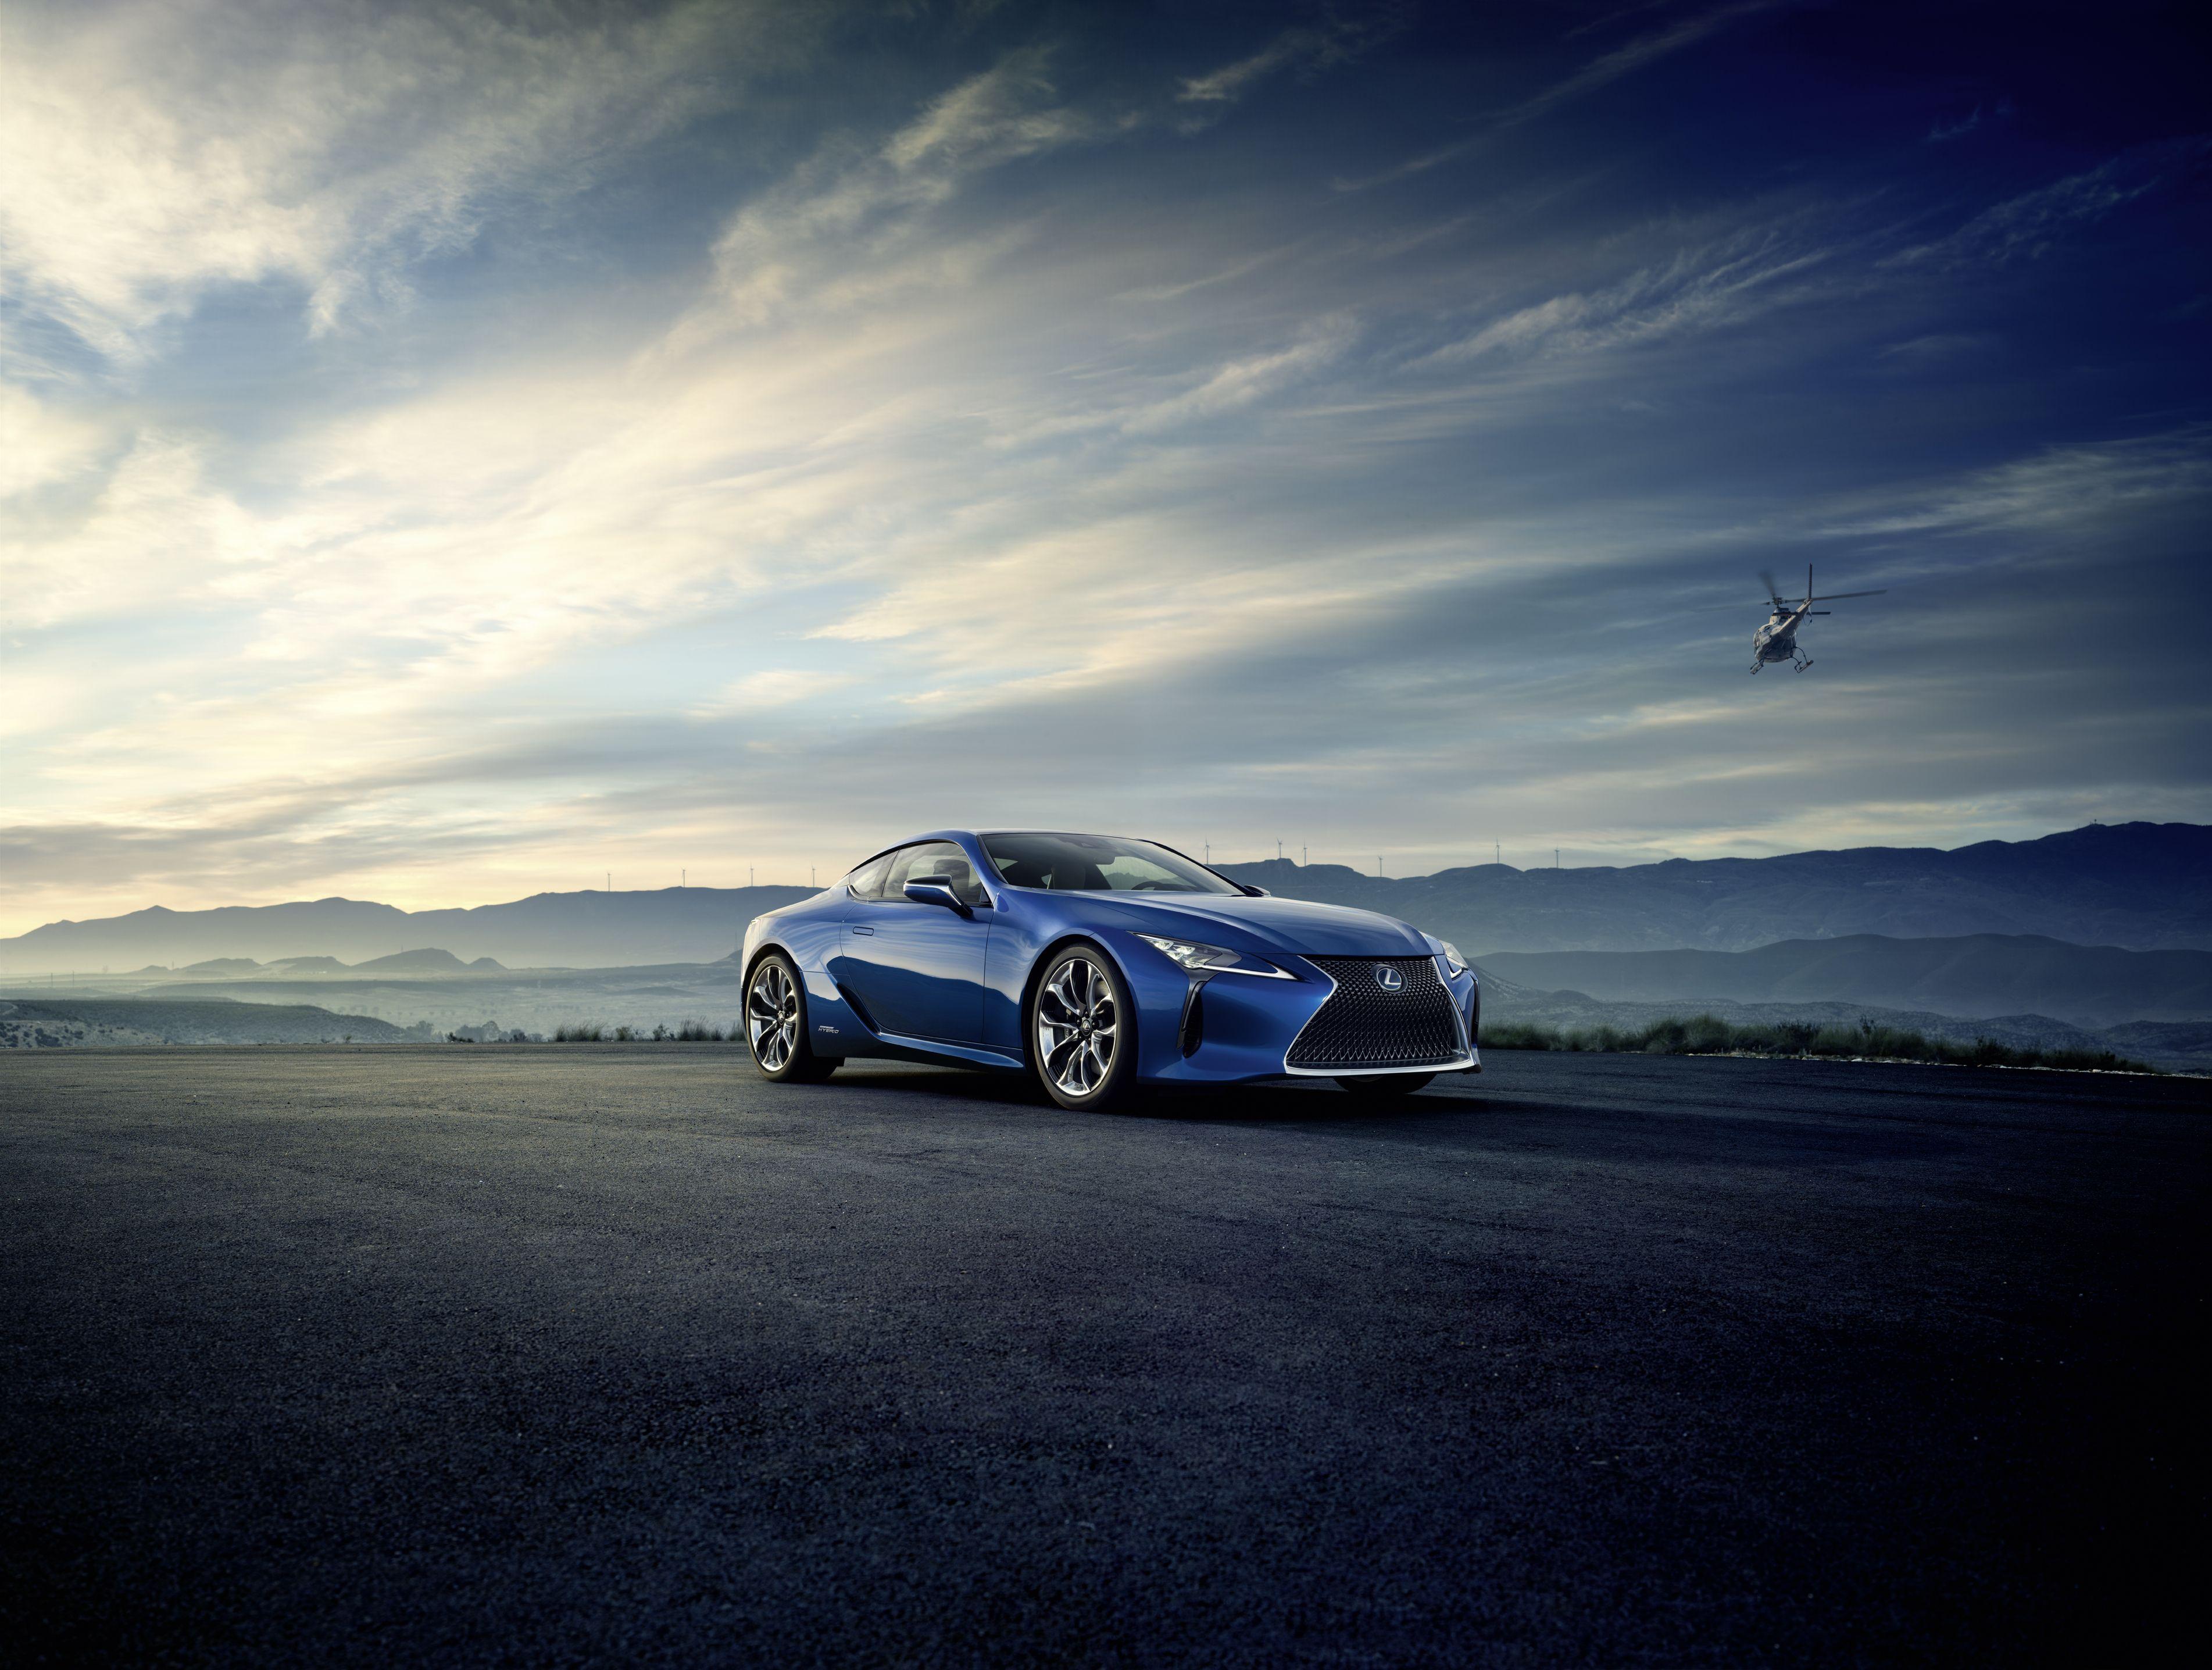 Lexus Lc 500 Hd Wallpaper Background Image 3805x2872 Id 688301